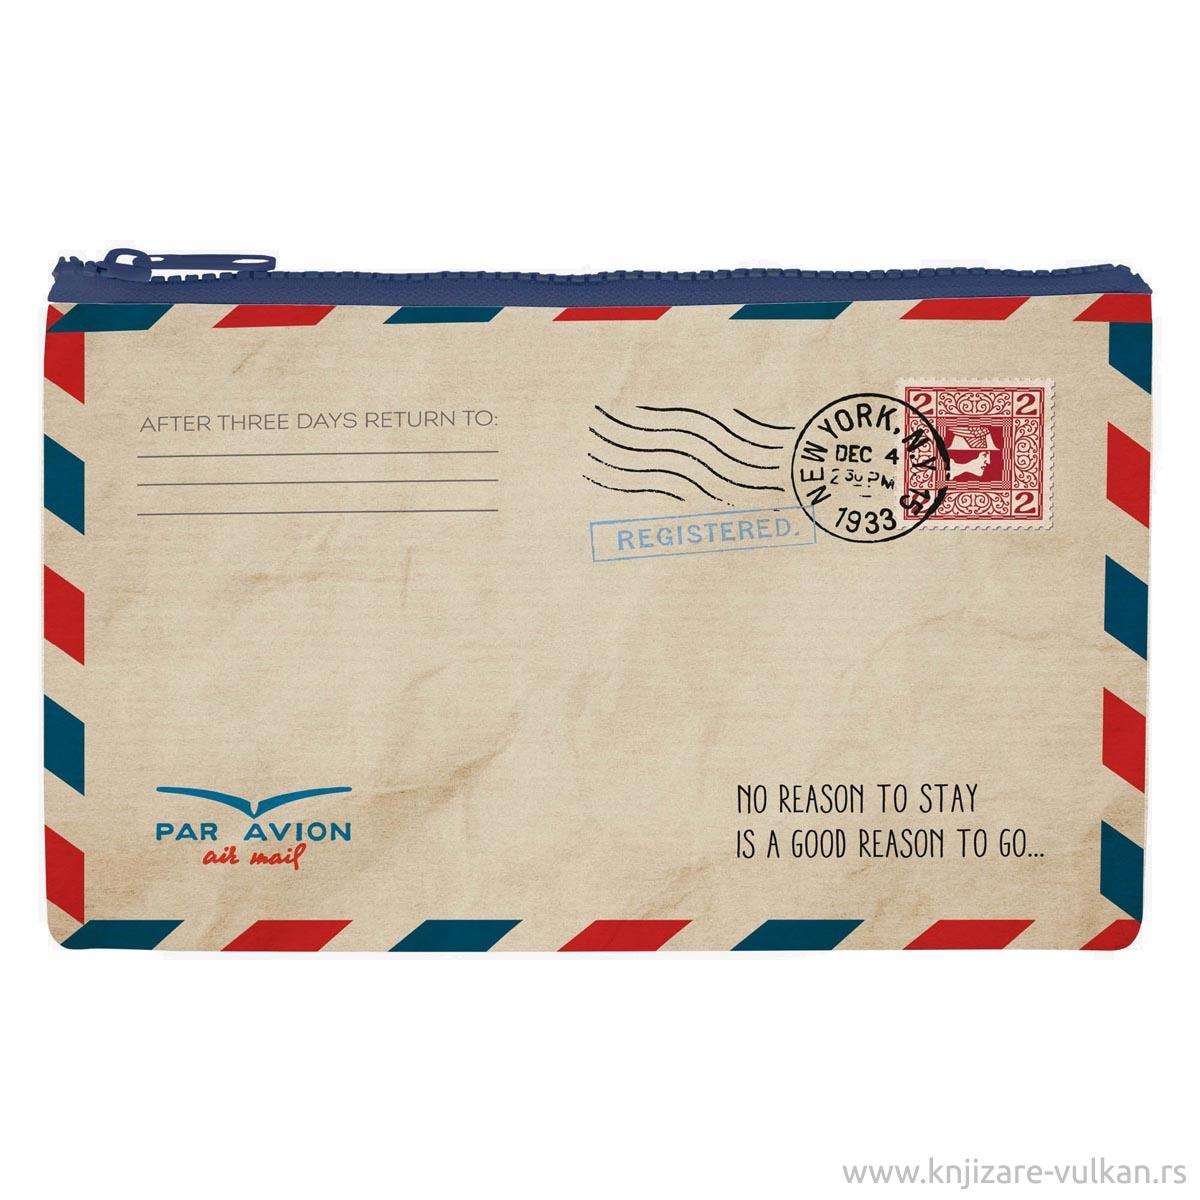 Futrola za olovke FUNKY COLLECTION Air Mail